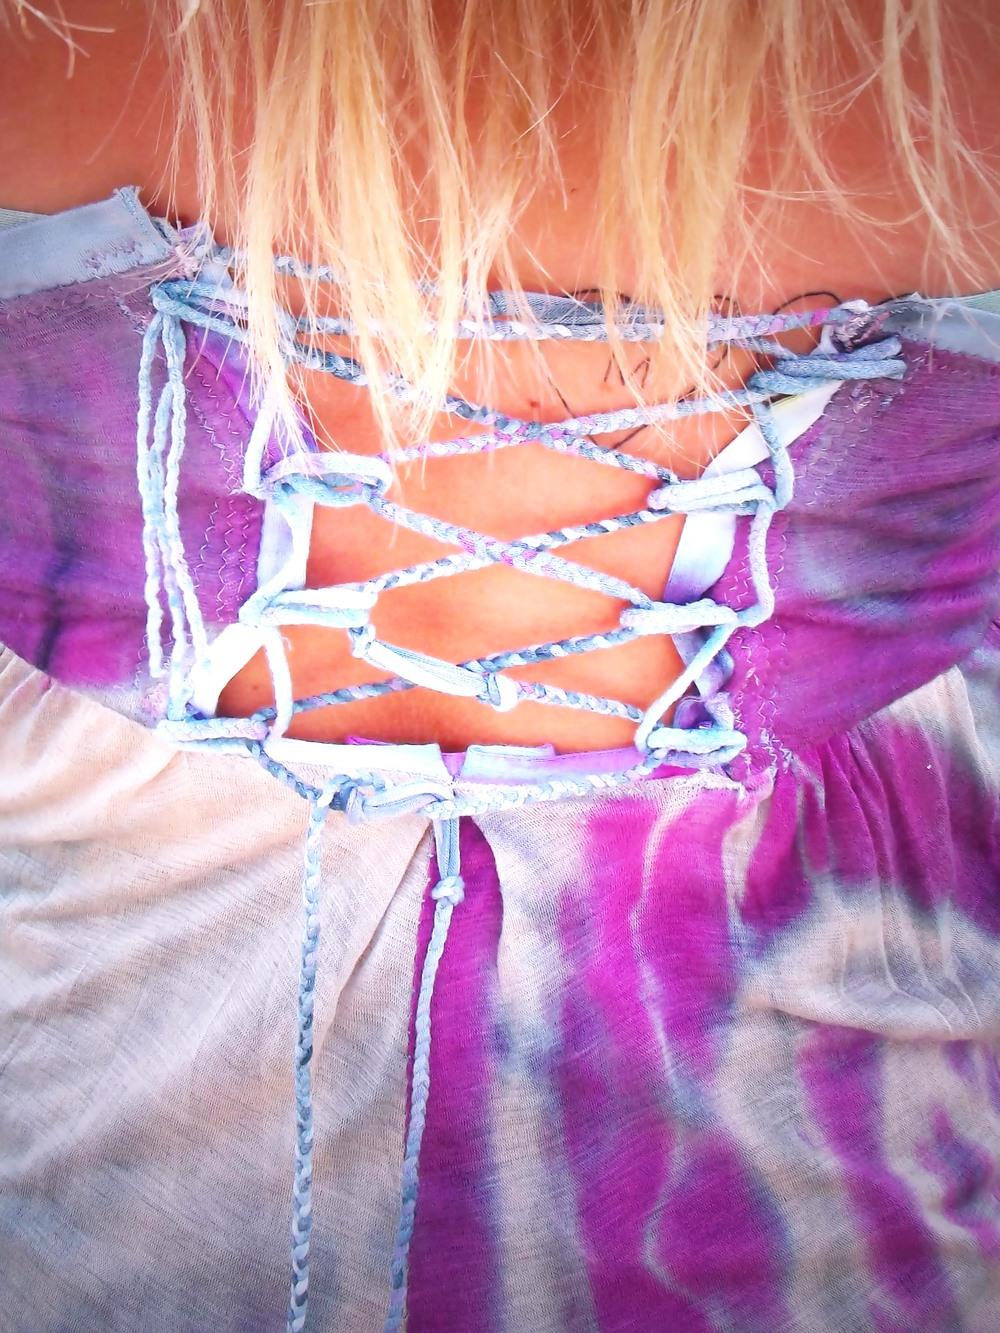 Lace-upSilkBack.jpg